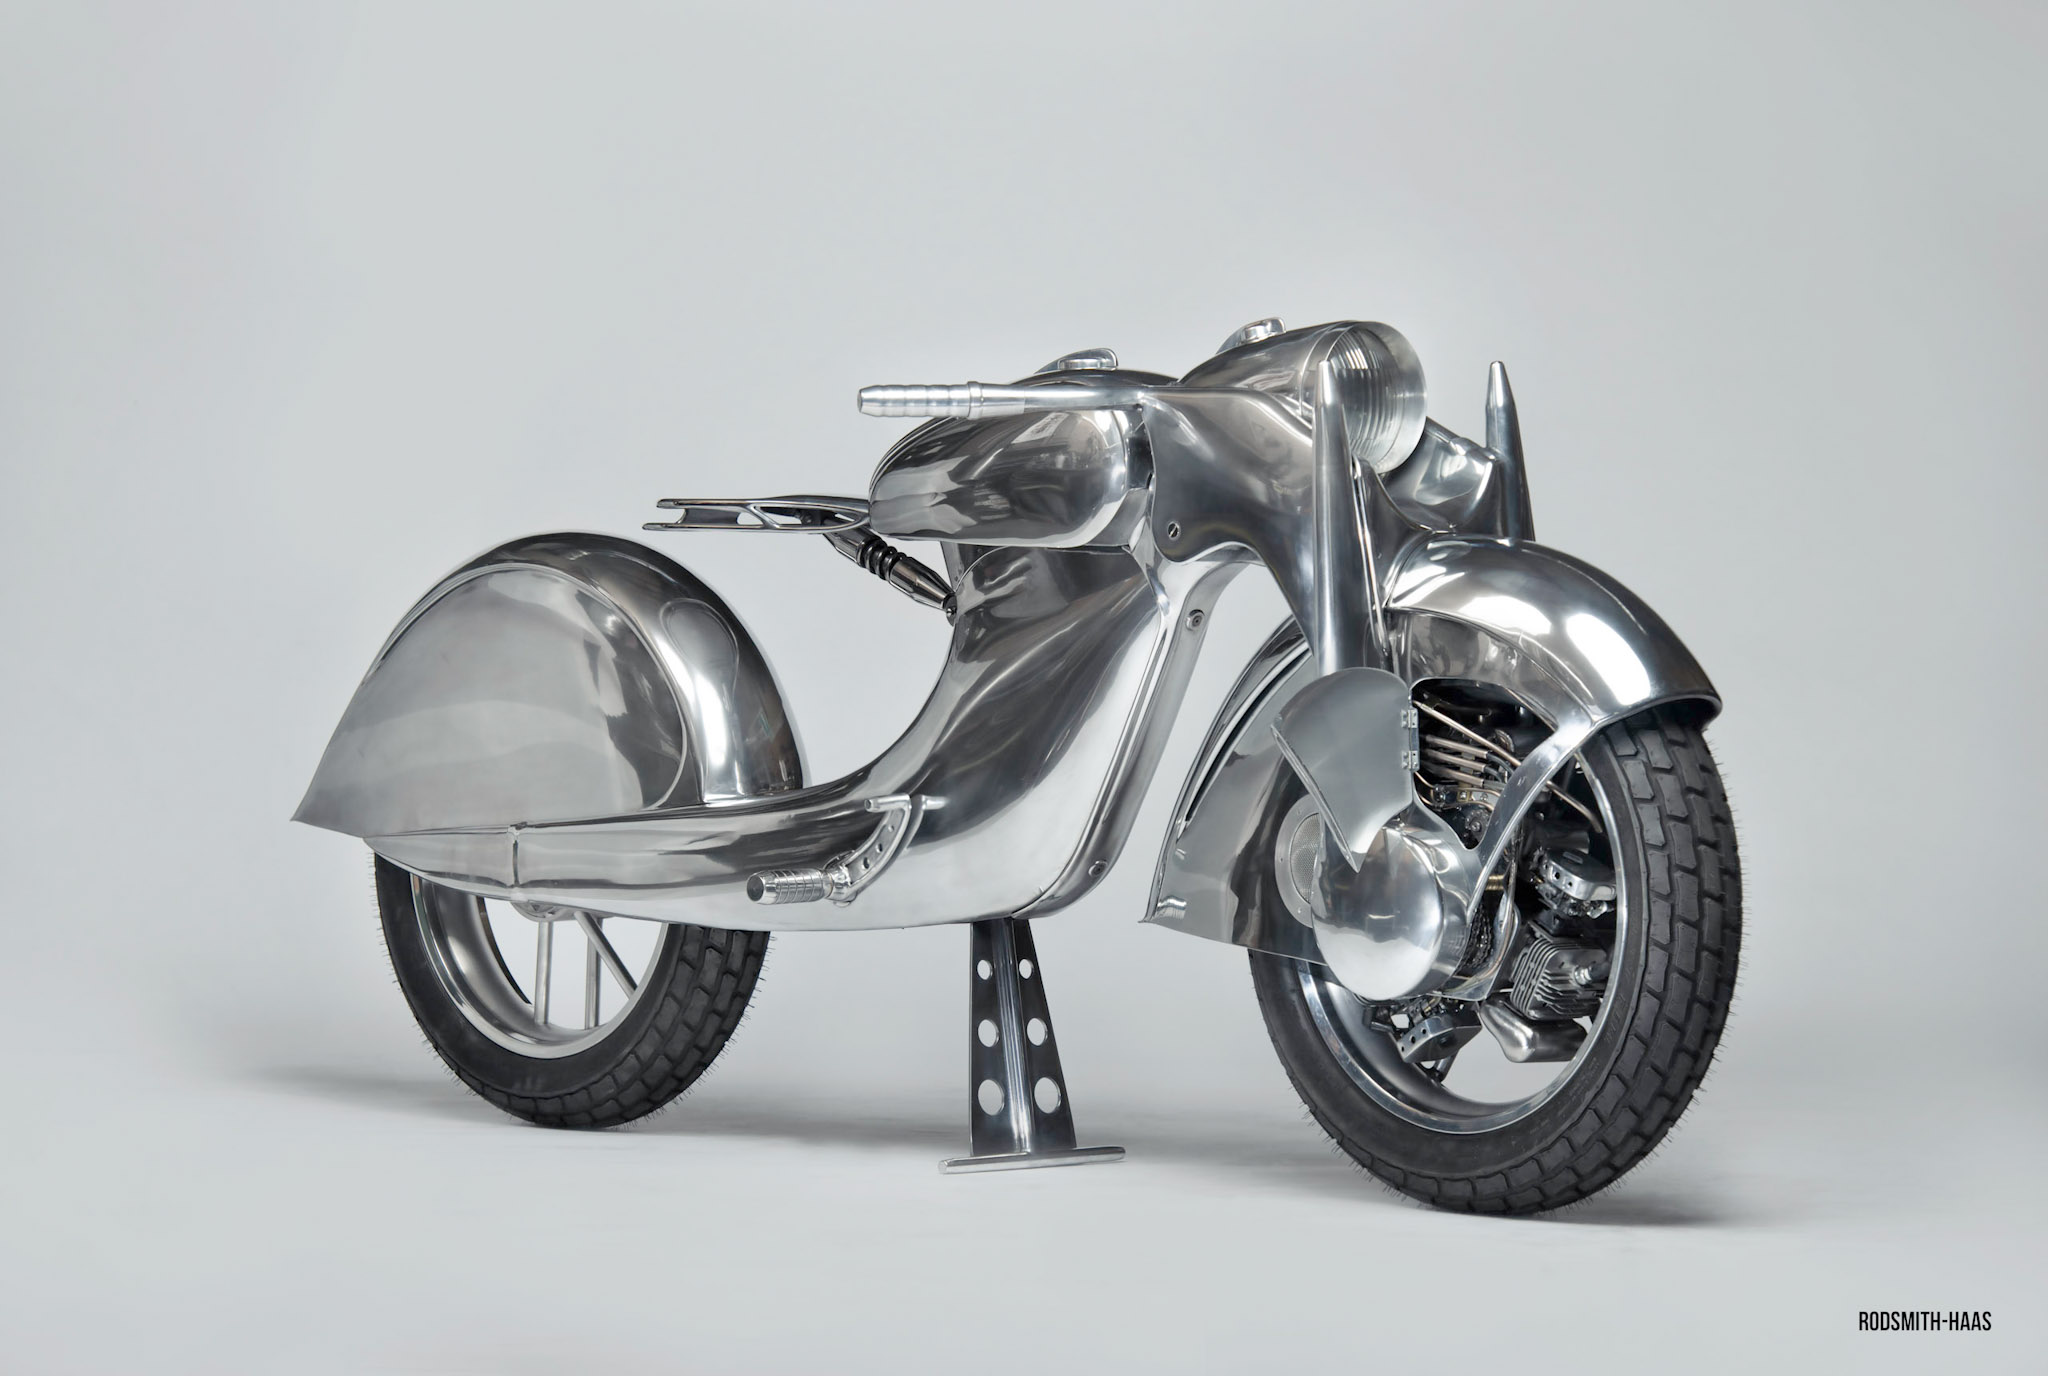 Craig Rodsmith's engine-wheeled custom bike 'The Killer'.